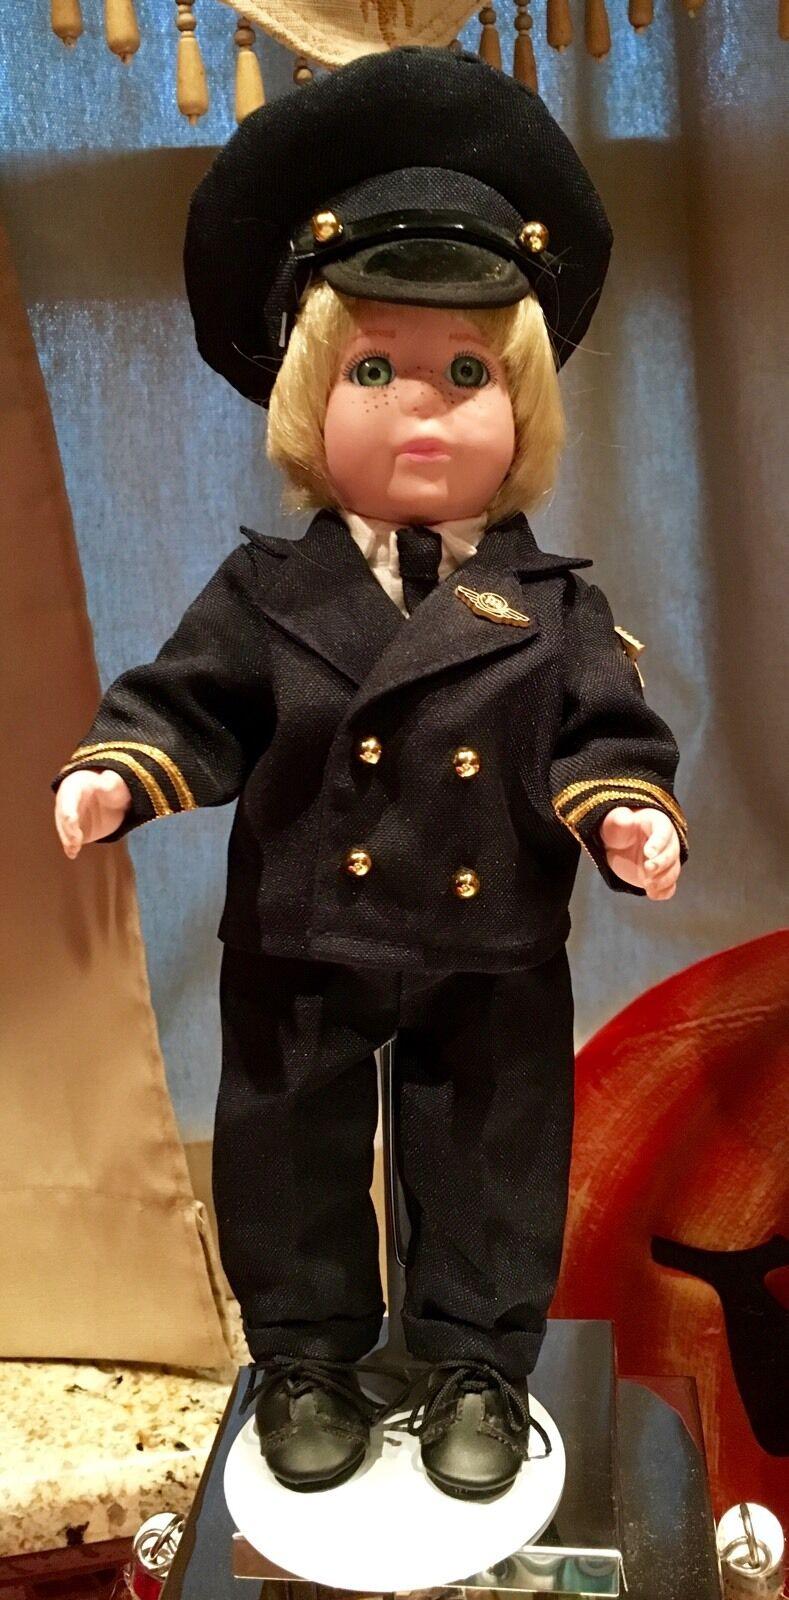 Airline Pilot Porcelain bambola Jointed For Posing -Boy- -Boy- -Boy- verde Eyes Blonde Hair d4ba67